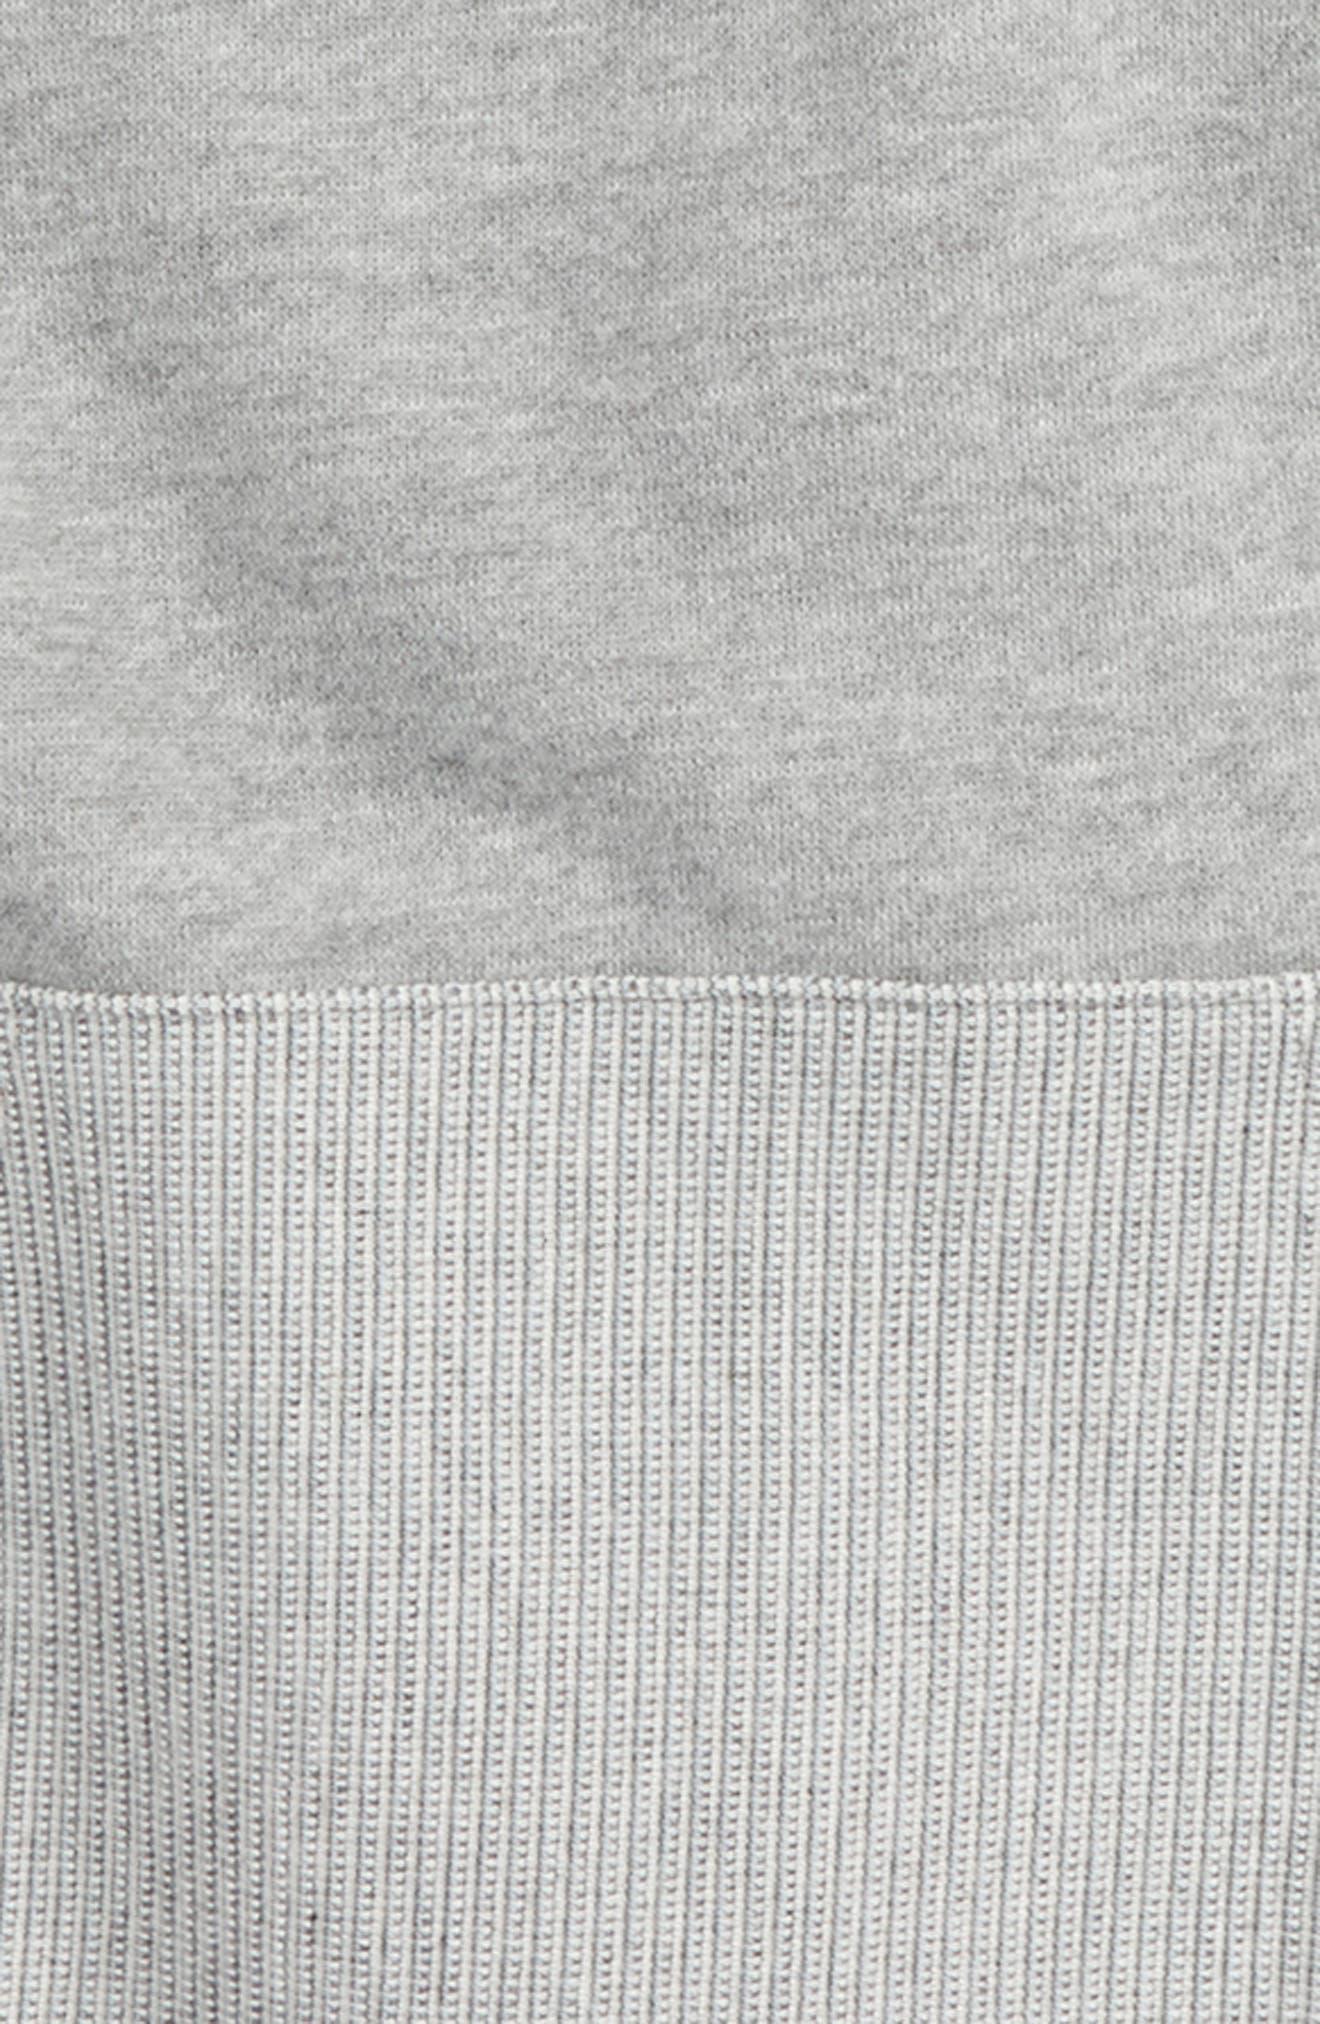 Alternate Image 2  - Converse Textured Knit Hoodie (Big Boys)